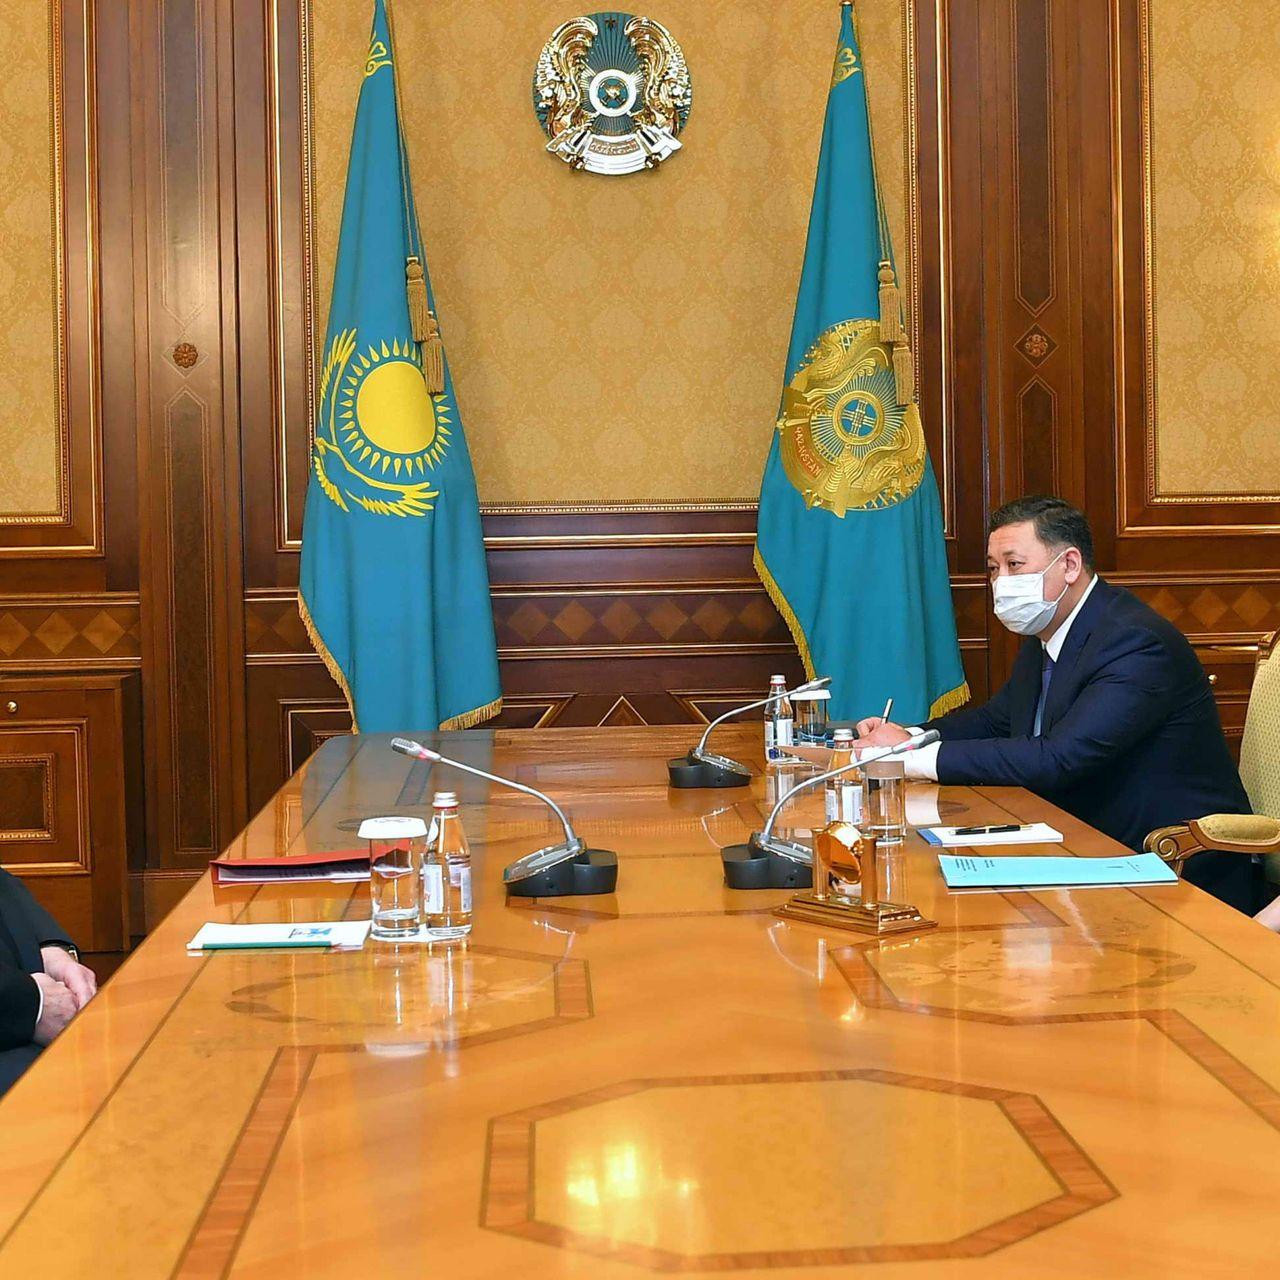 President Kassym-Jomart Tokayev receives Ambassador of Russia to Kazakhstan Alexey Borodavkin